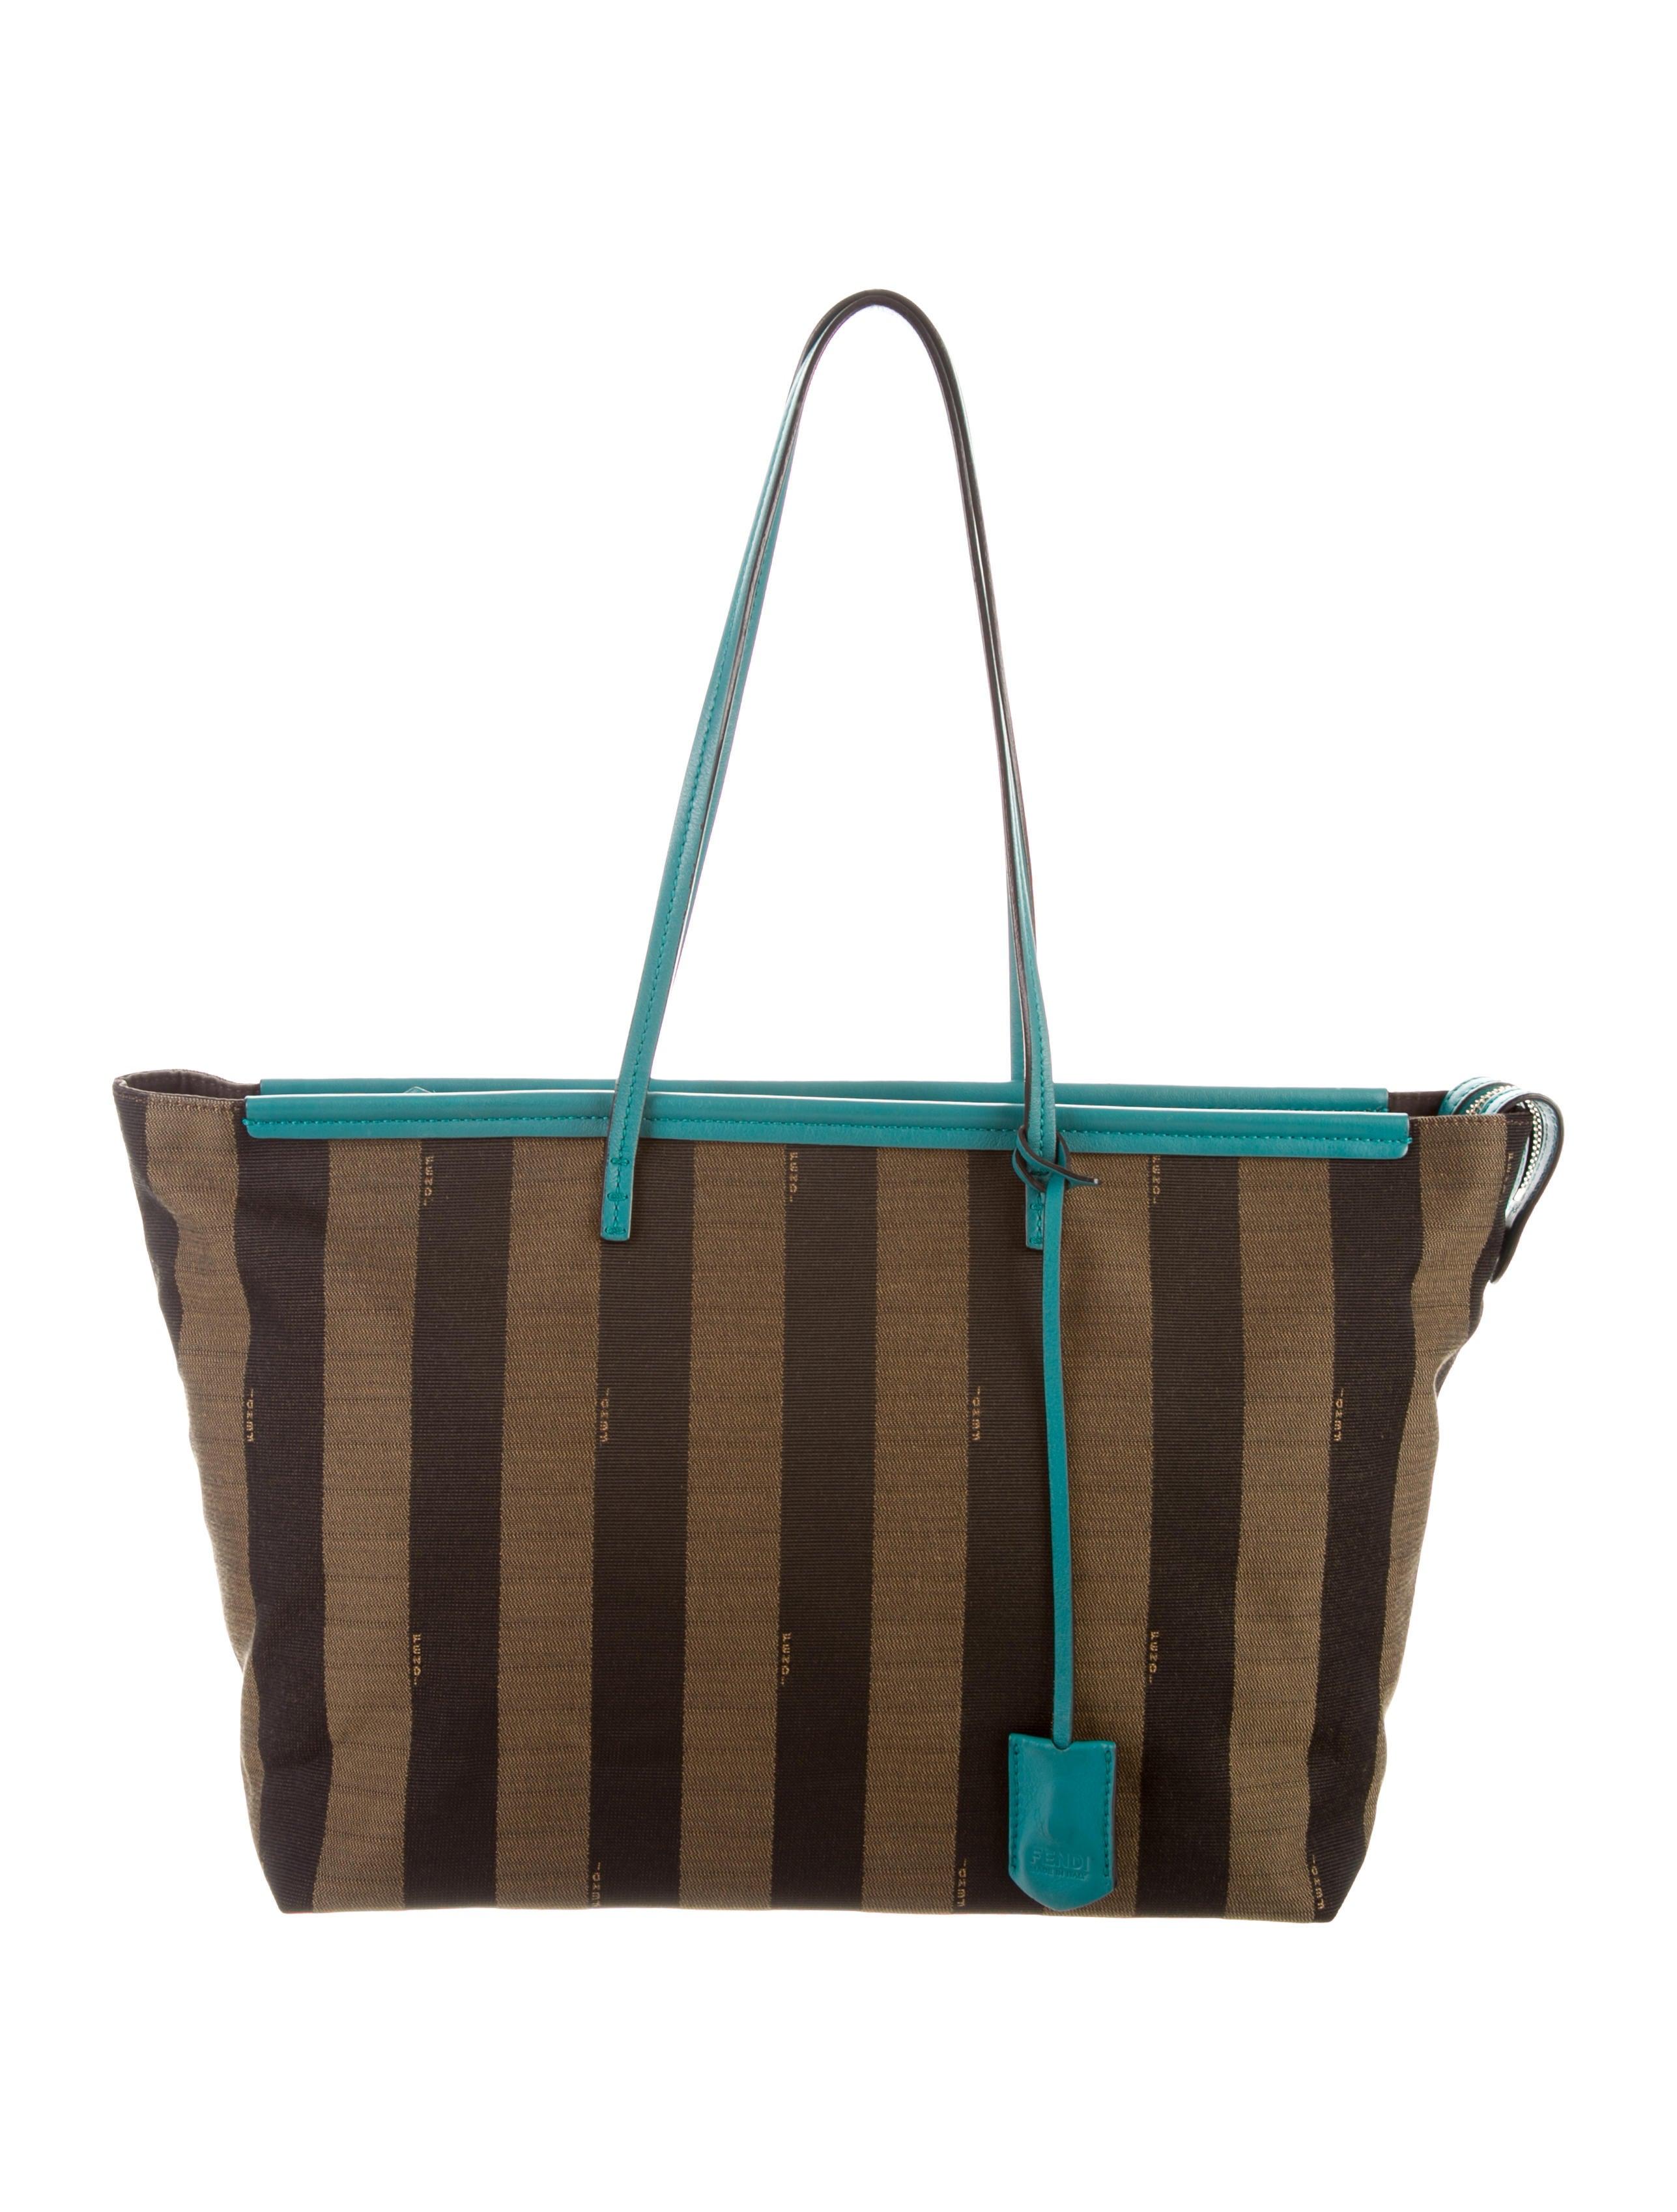 378b6309475c Fendi Leather-Trimmed Pequin Tote - Handbags - FEN76891